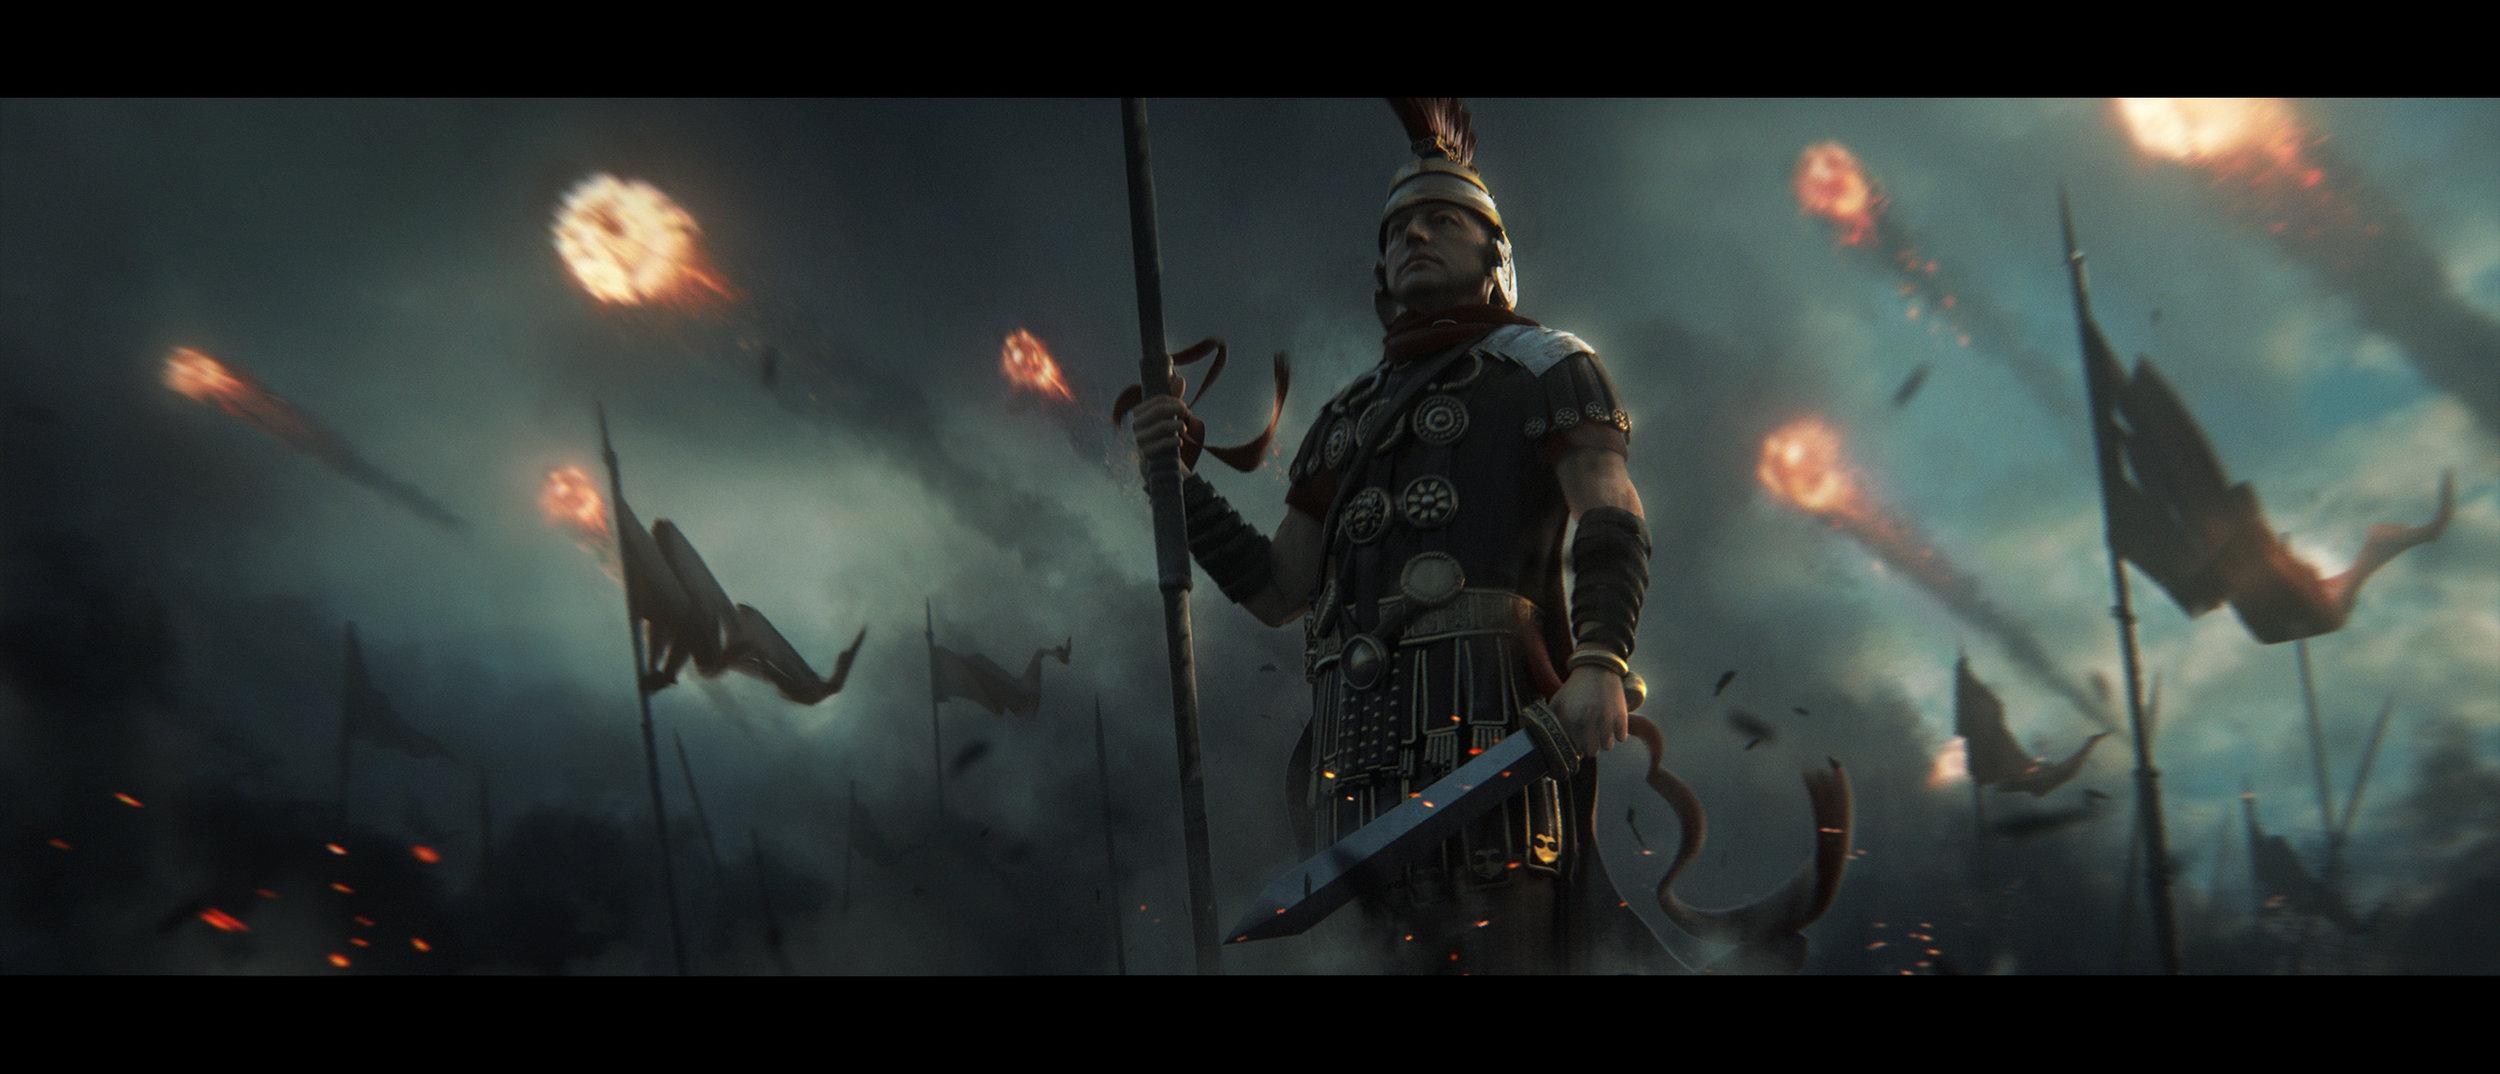 roman_commander_by_snikola_dcabwgj.jpg